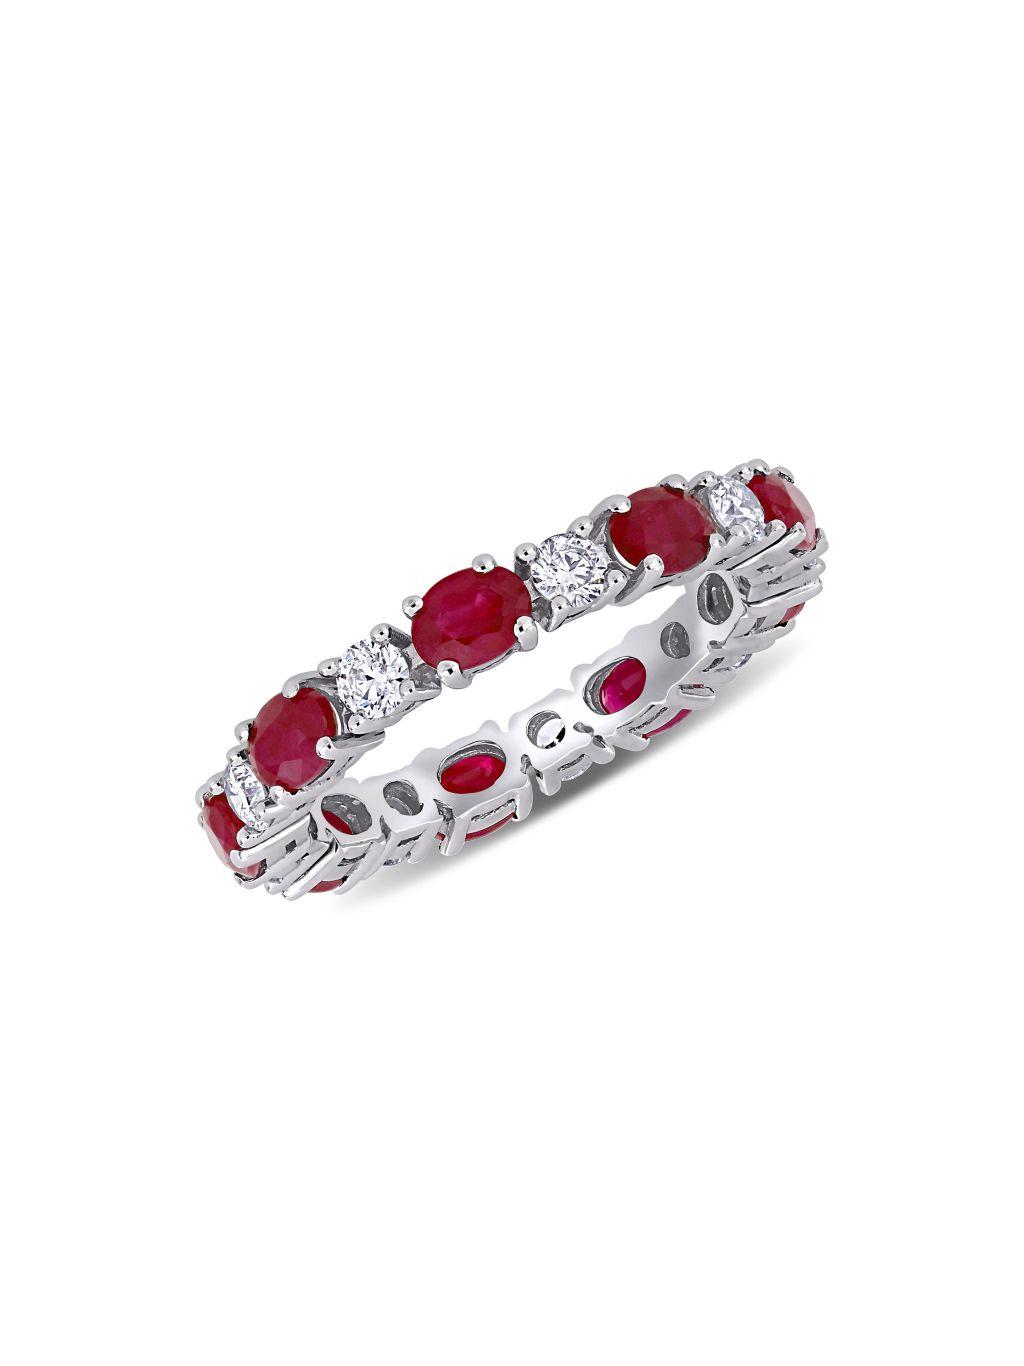 Saks Fifth Avenue 14K White Gold, Ruby & Diamond Ring